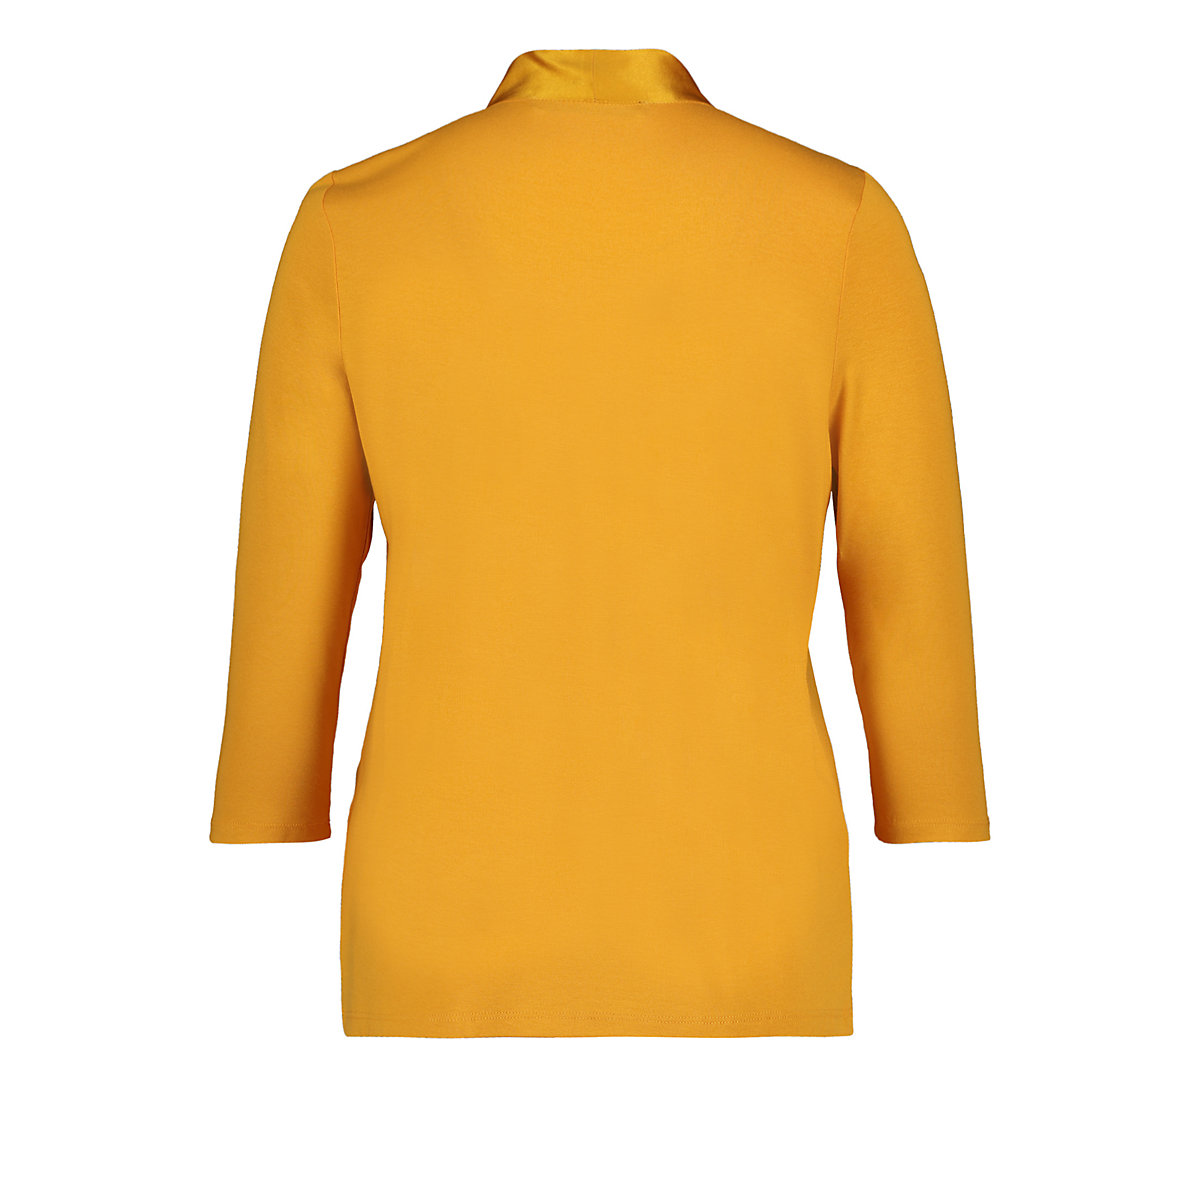 Betty Barclay Betty Barclay Schluppenshirt unifarben 3/4-Arm-Shirts gelb